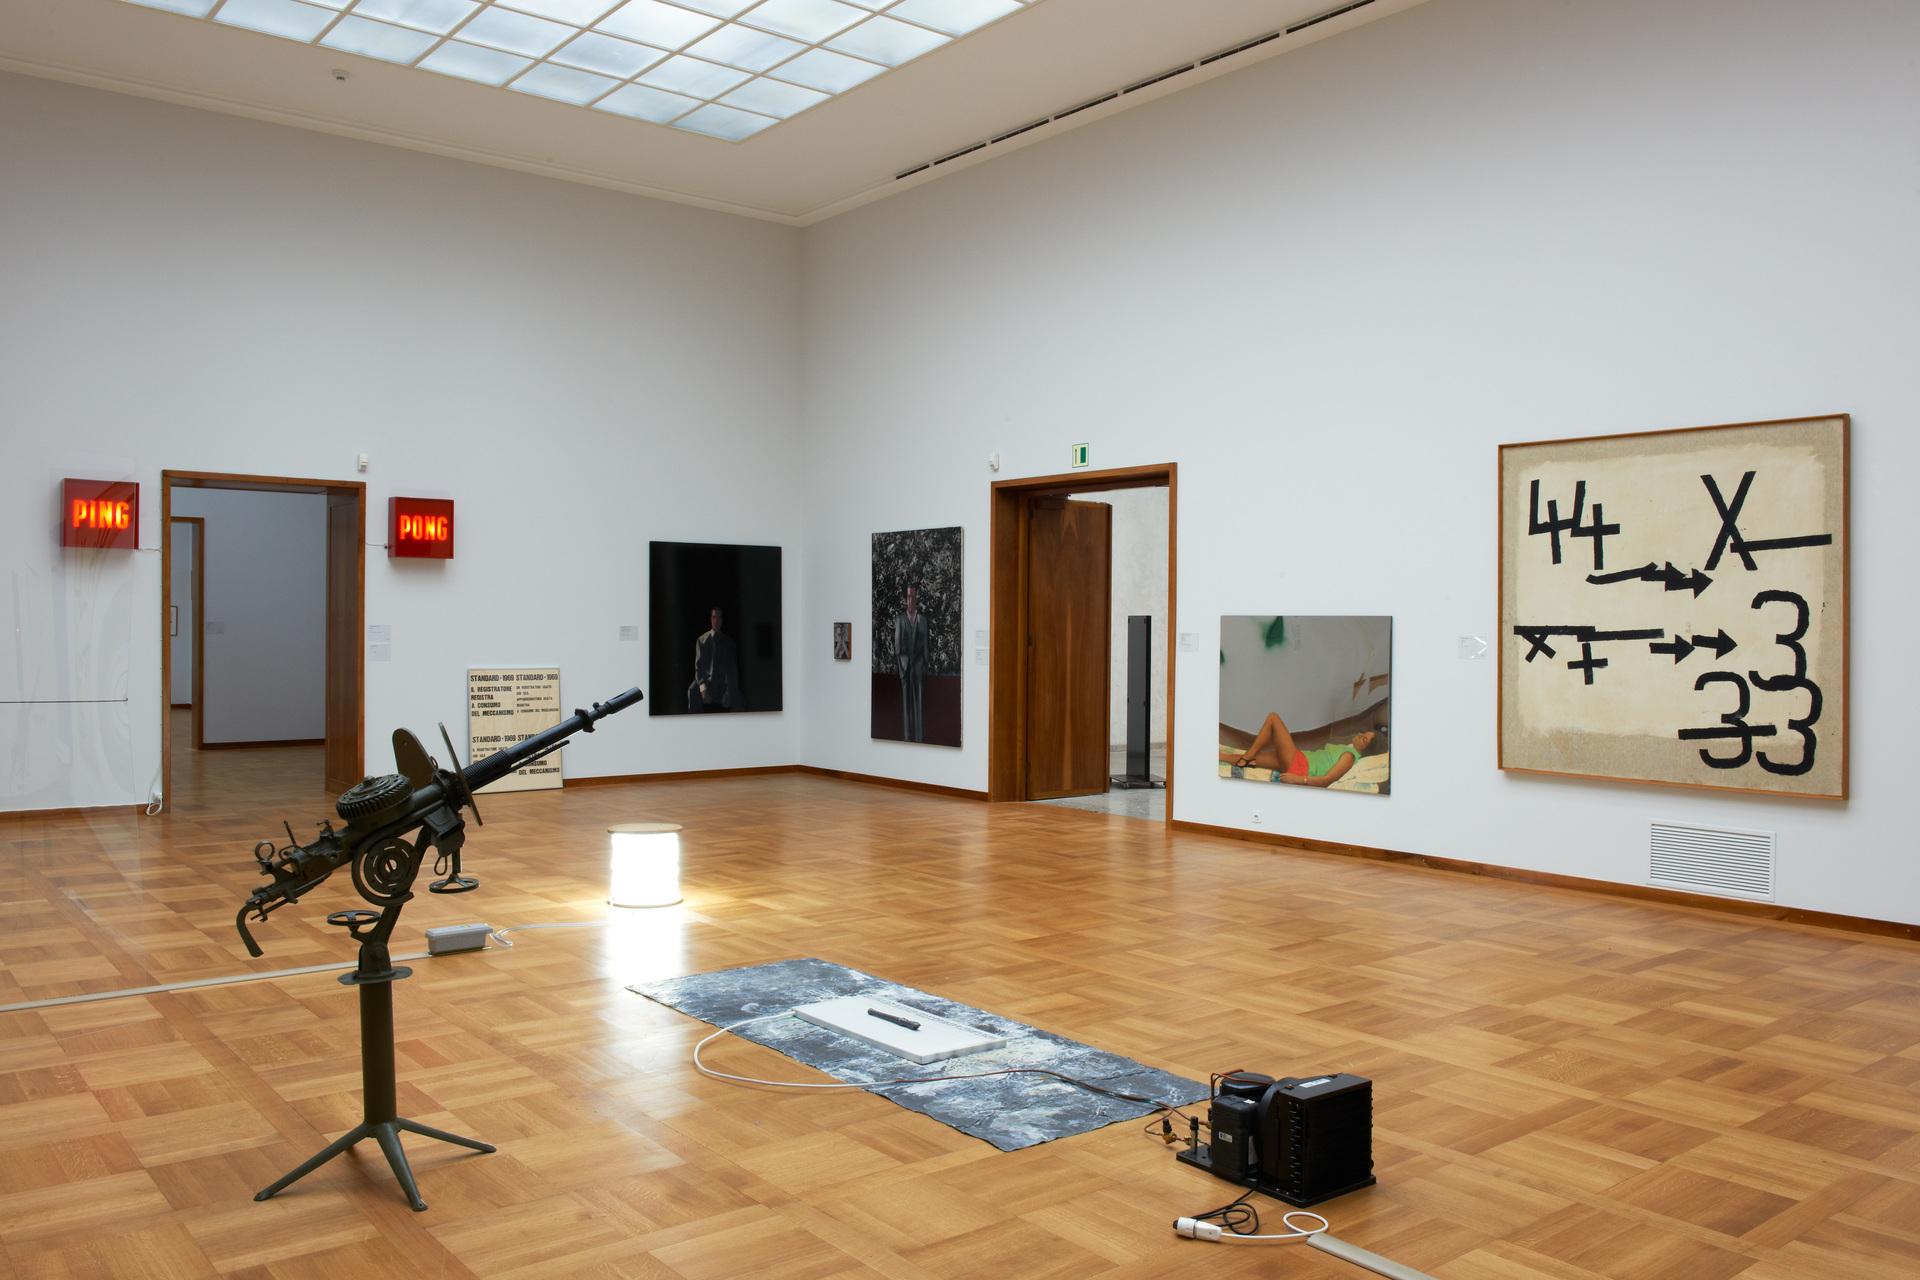 Arte povera kunstmuseum basel for Piattaie arte povera